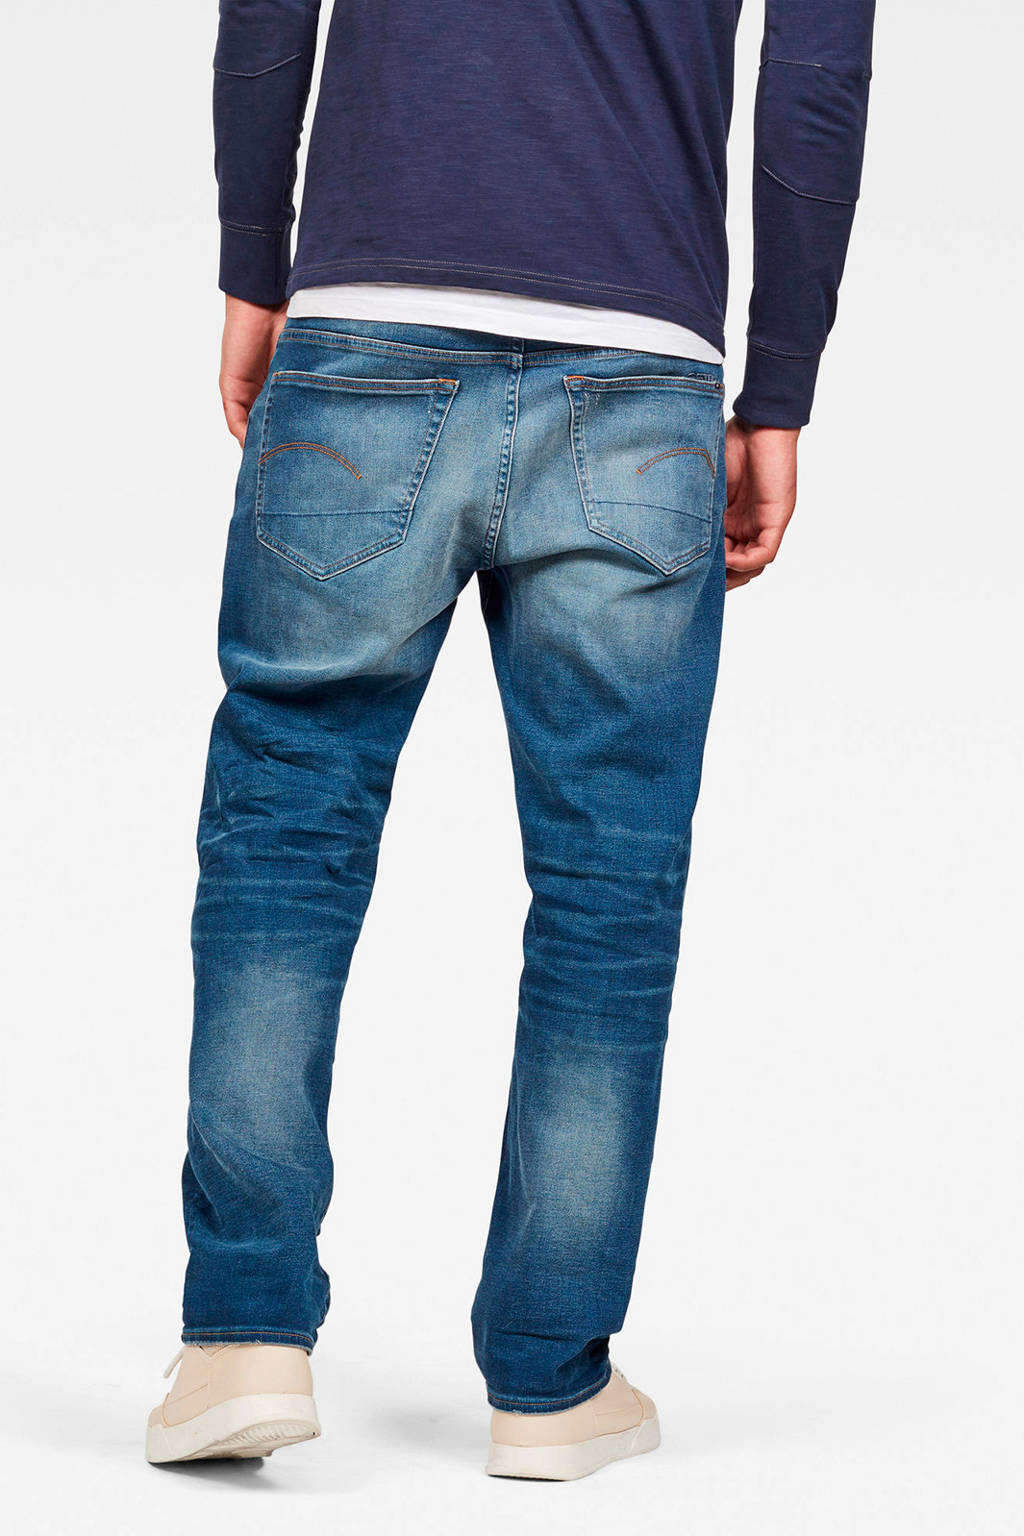 G-Star RAW 3301 regular fit jeans worker blue fade, Worker blue fade